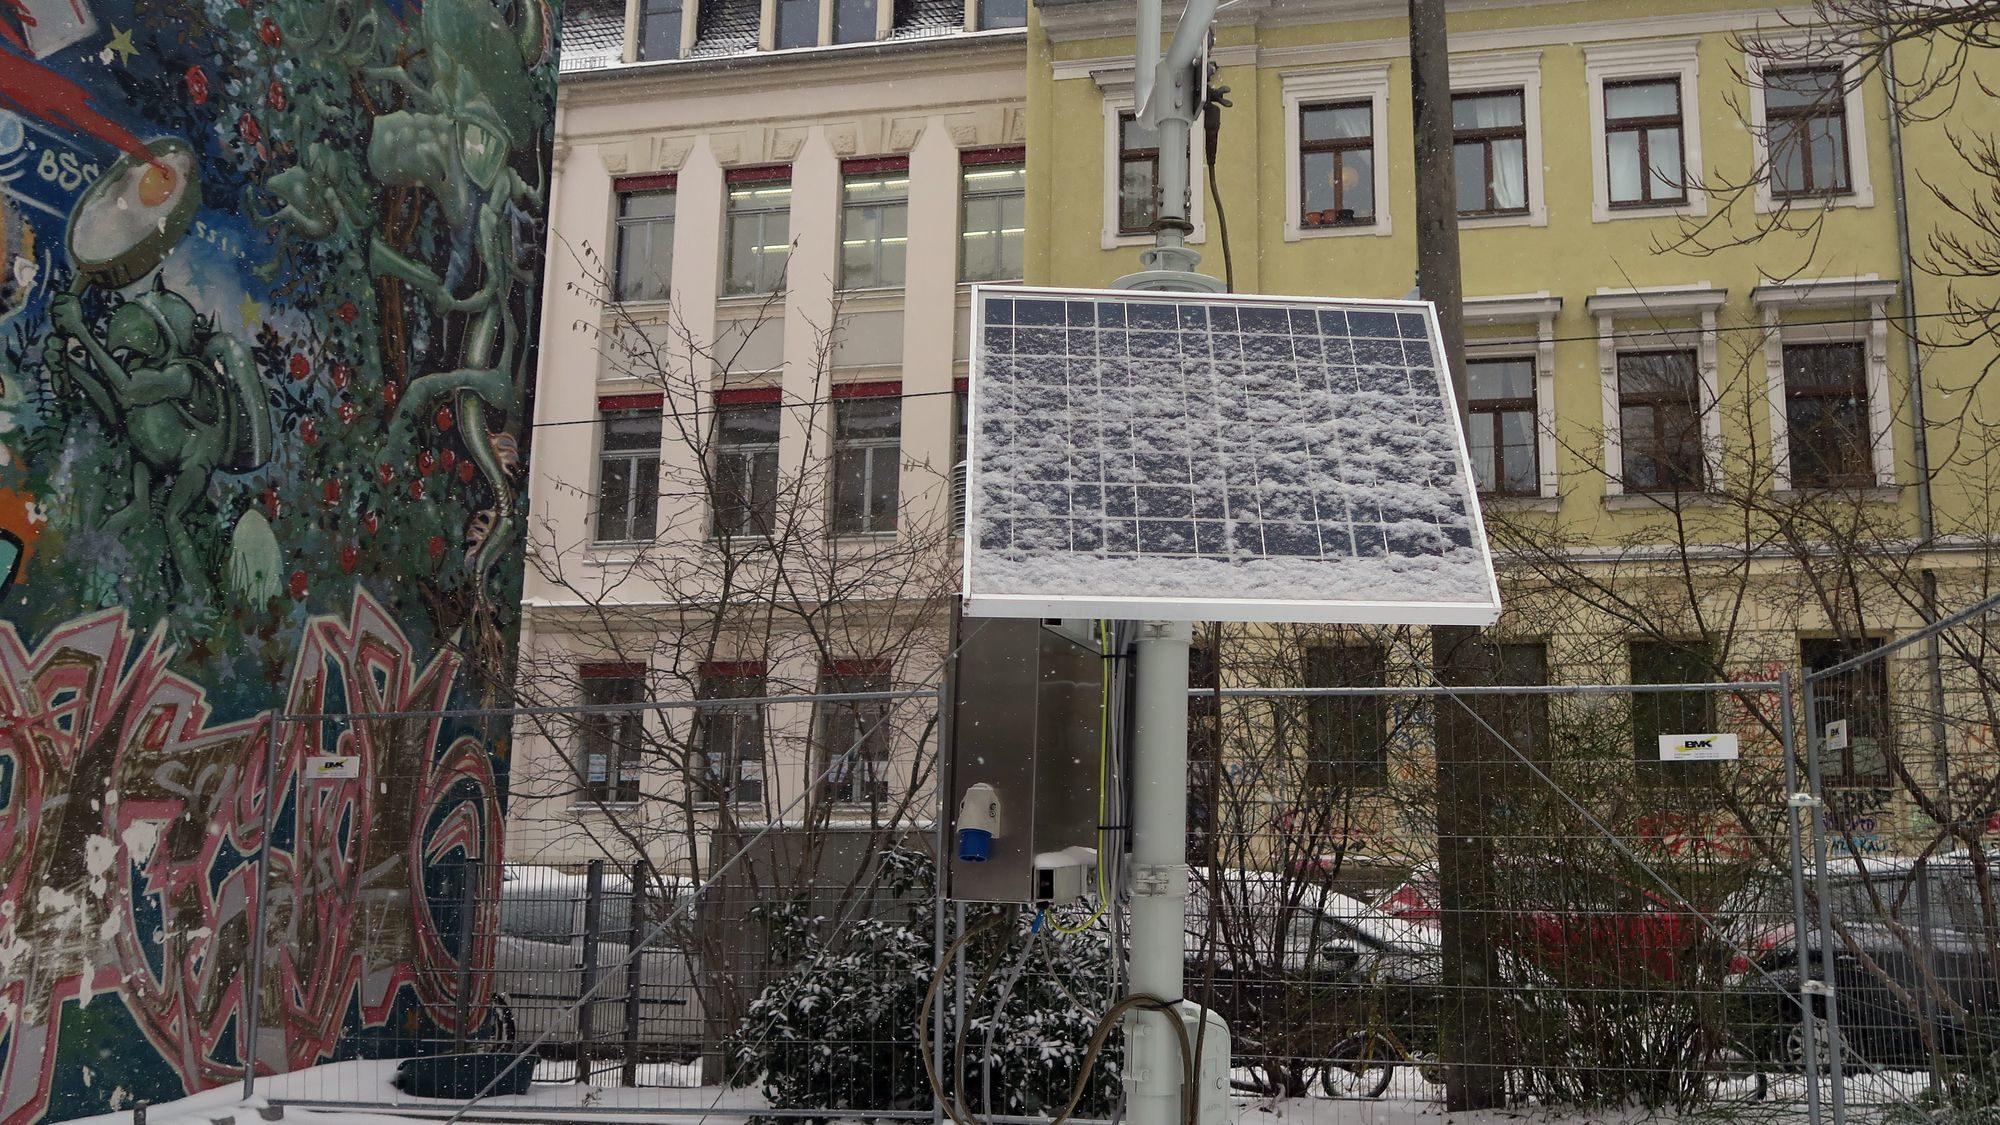 Neue Wetter-Mess-Station an der Försterei-/Ecke Jordanstraße